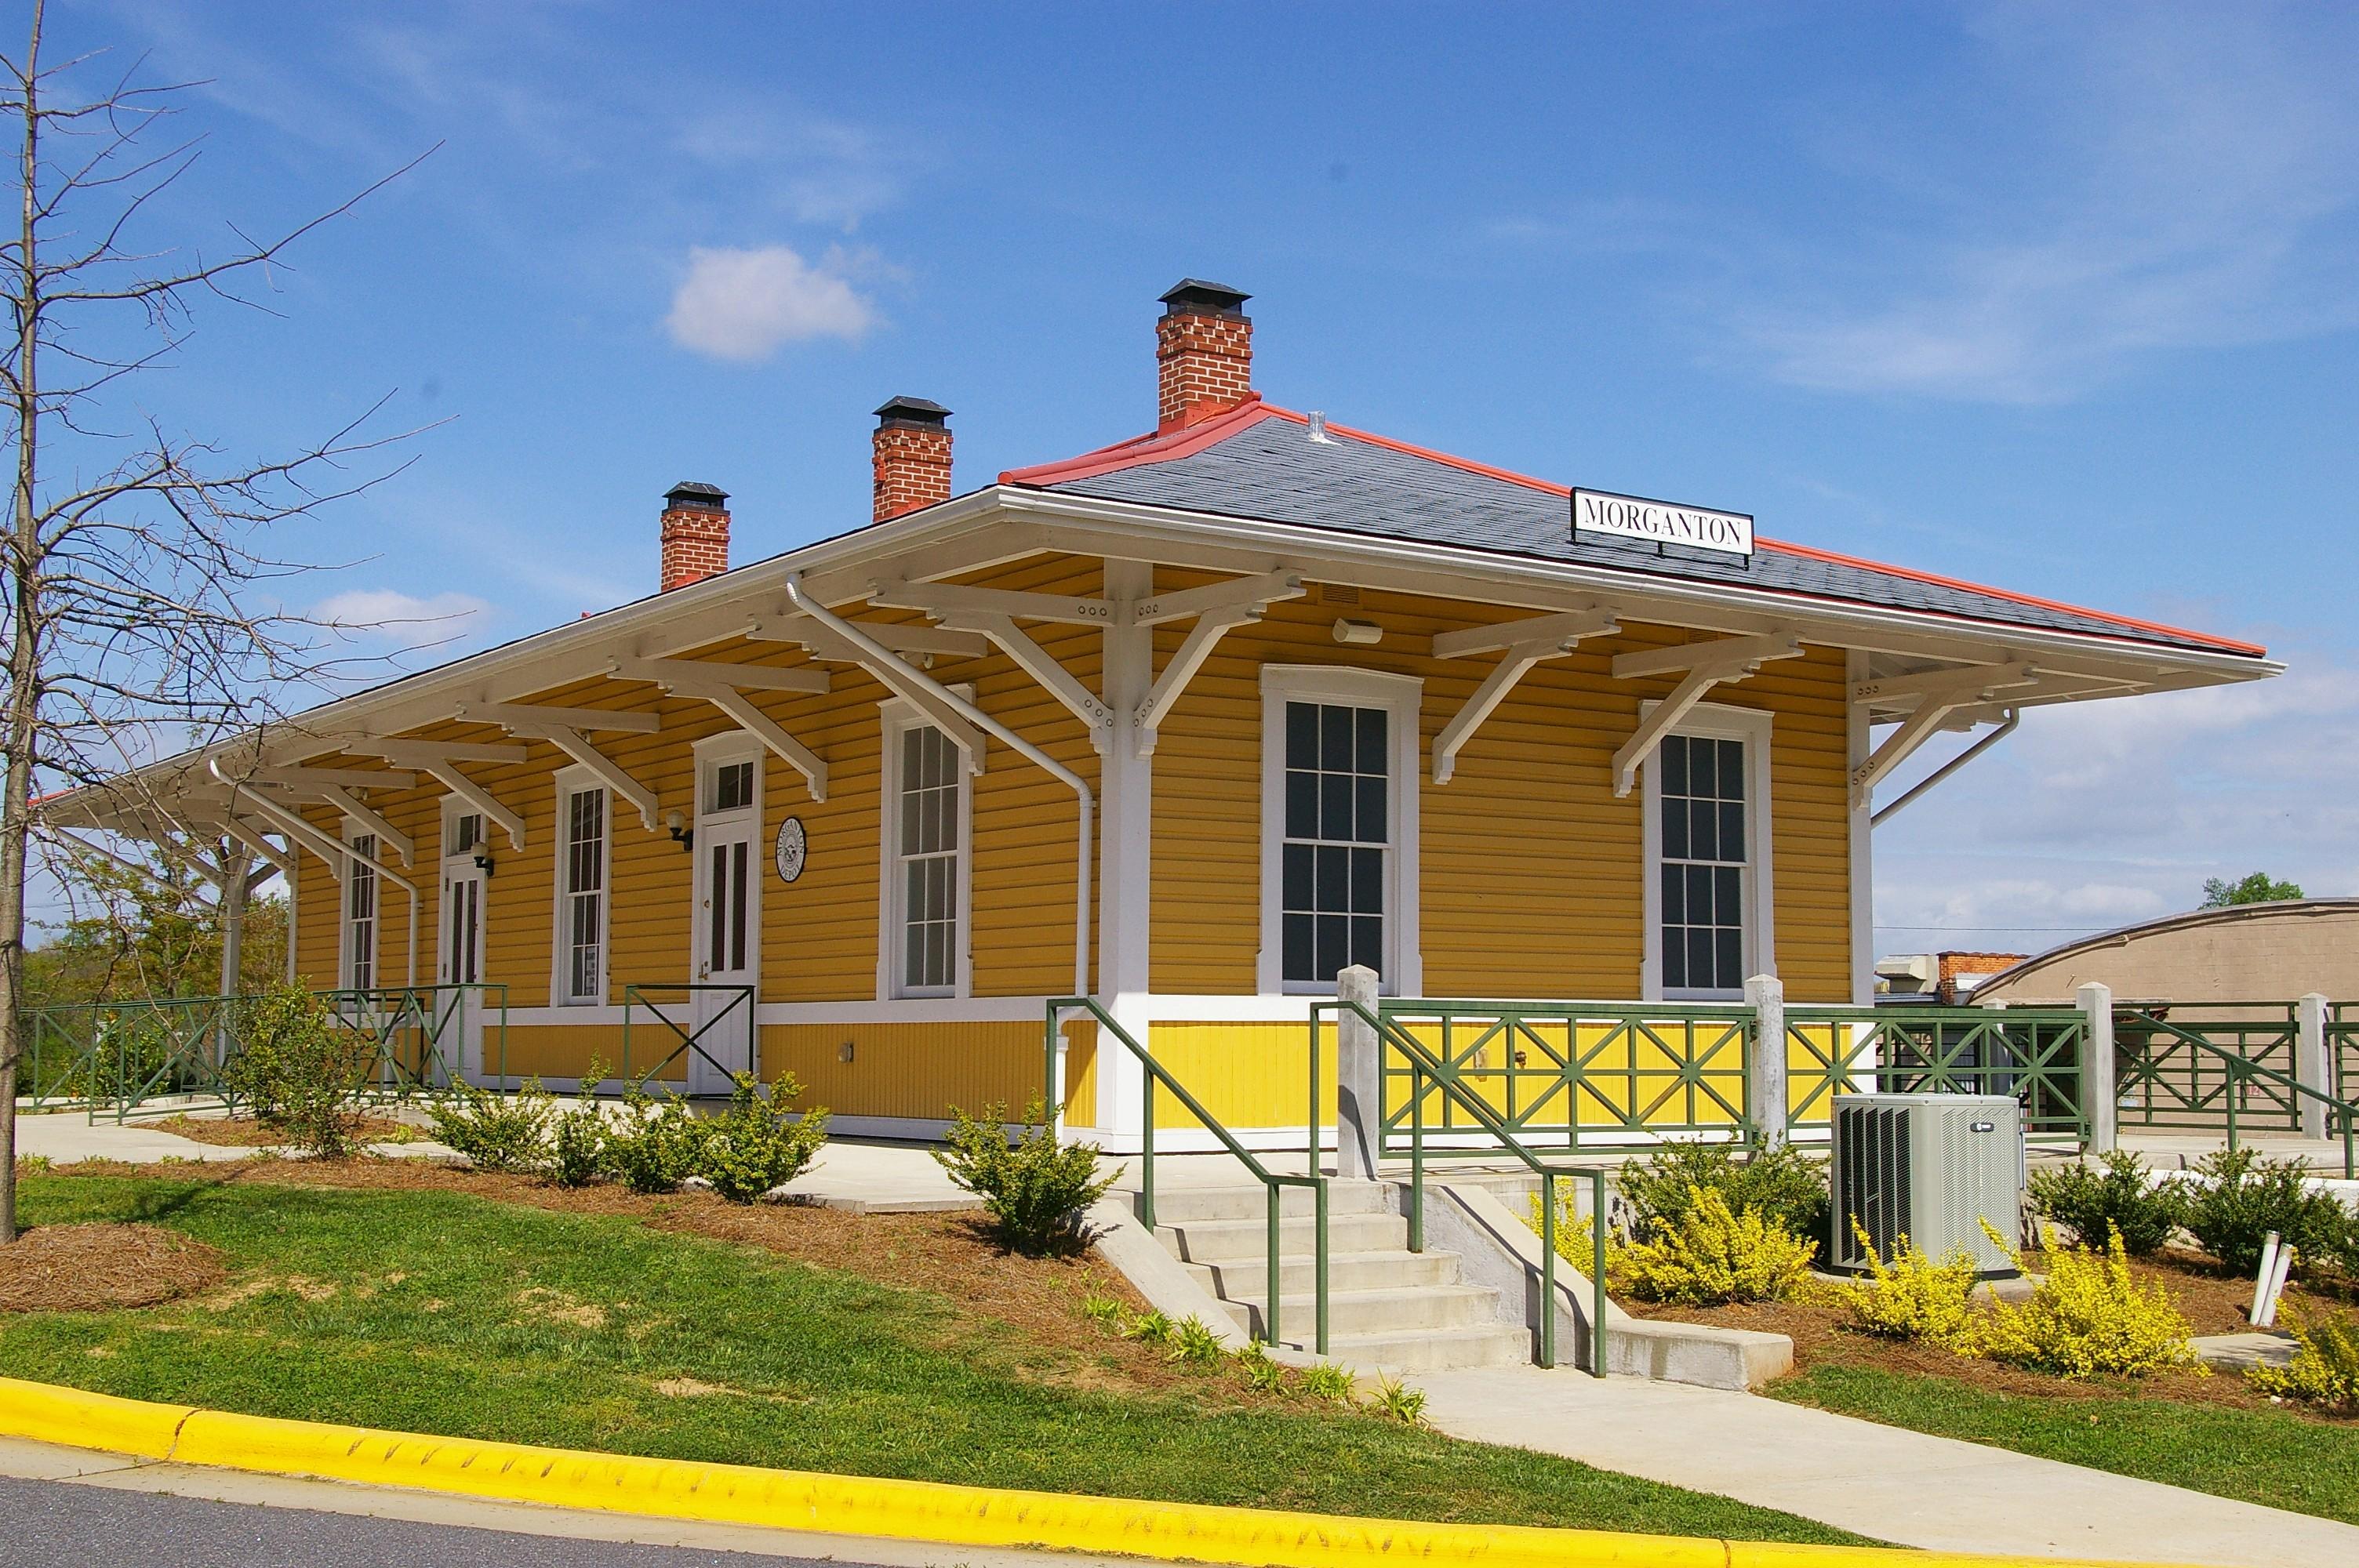 Morganton, North Carolina - Wikipedia